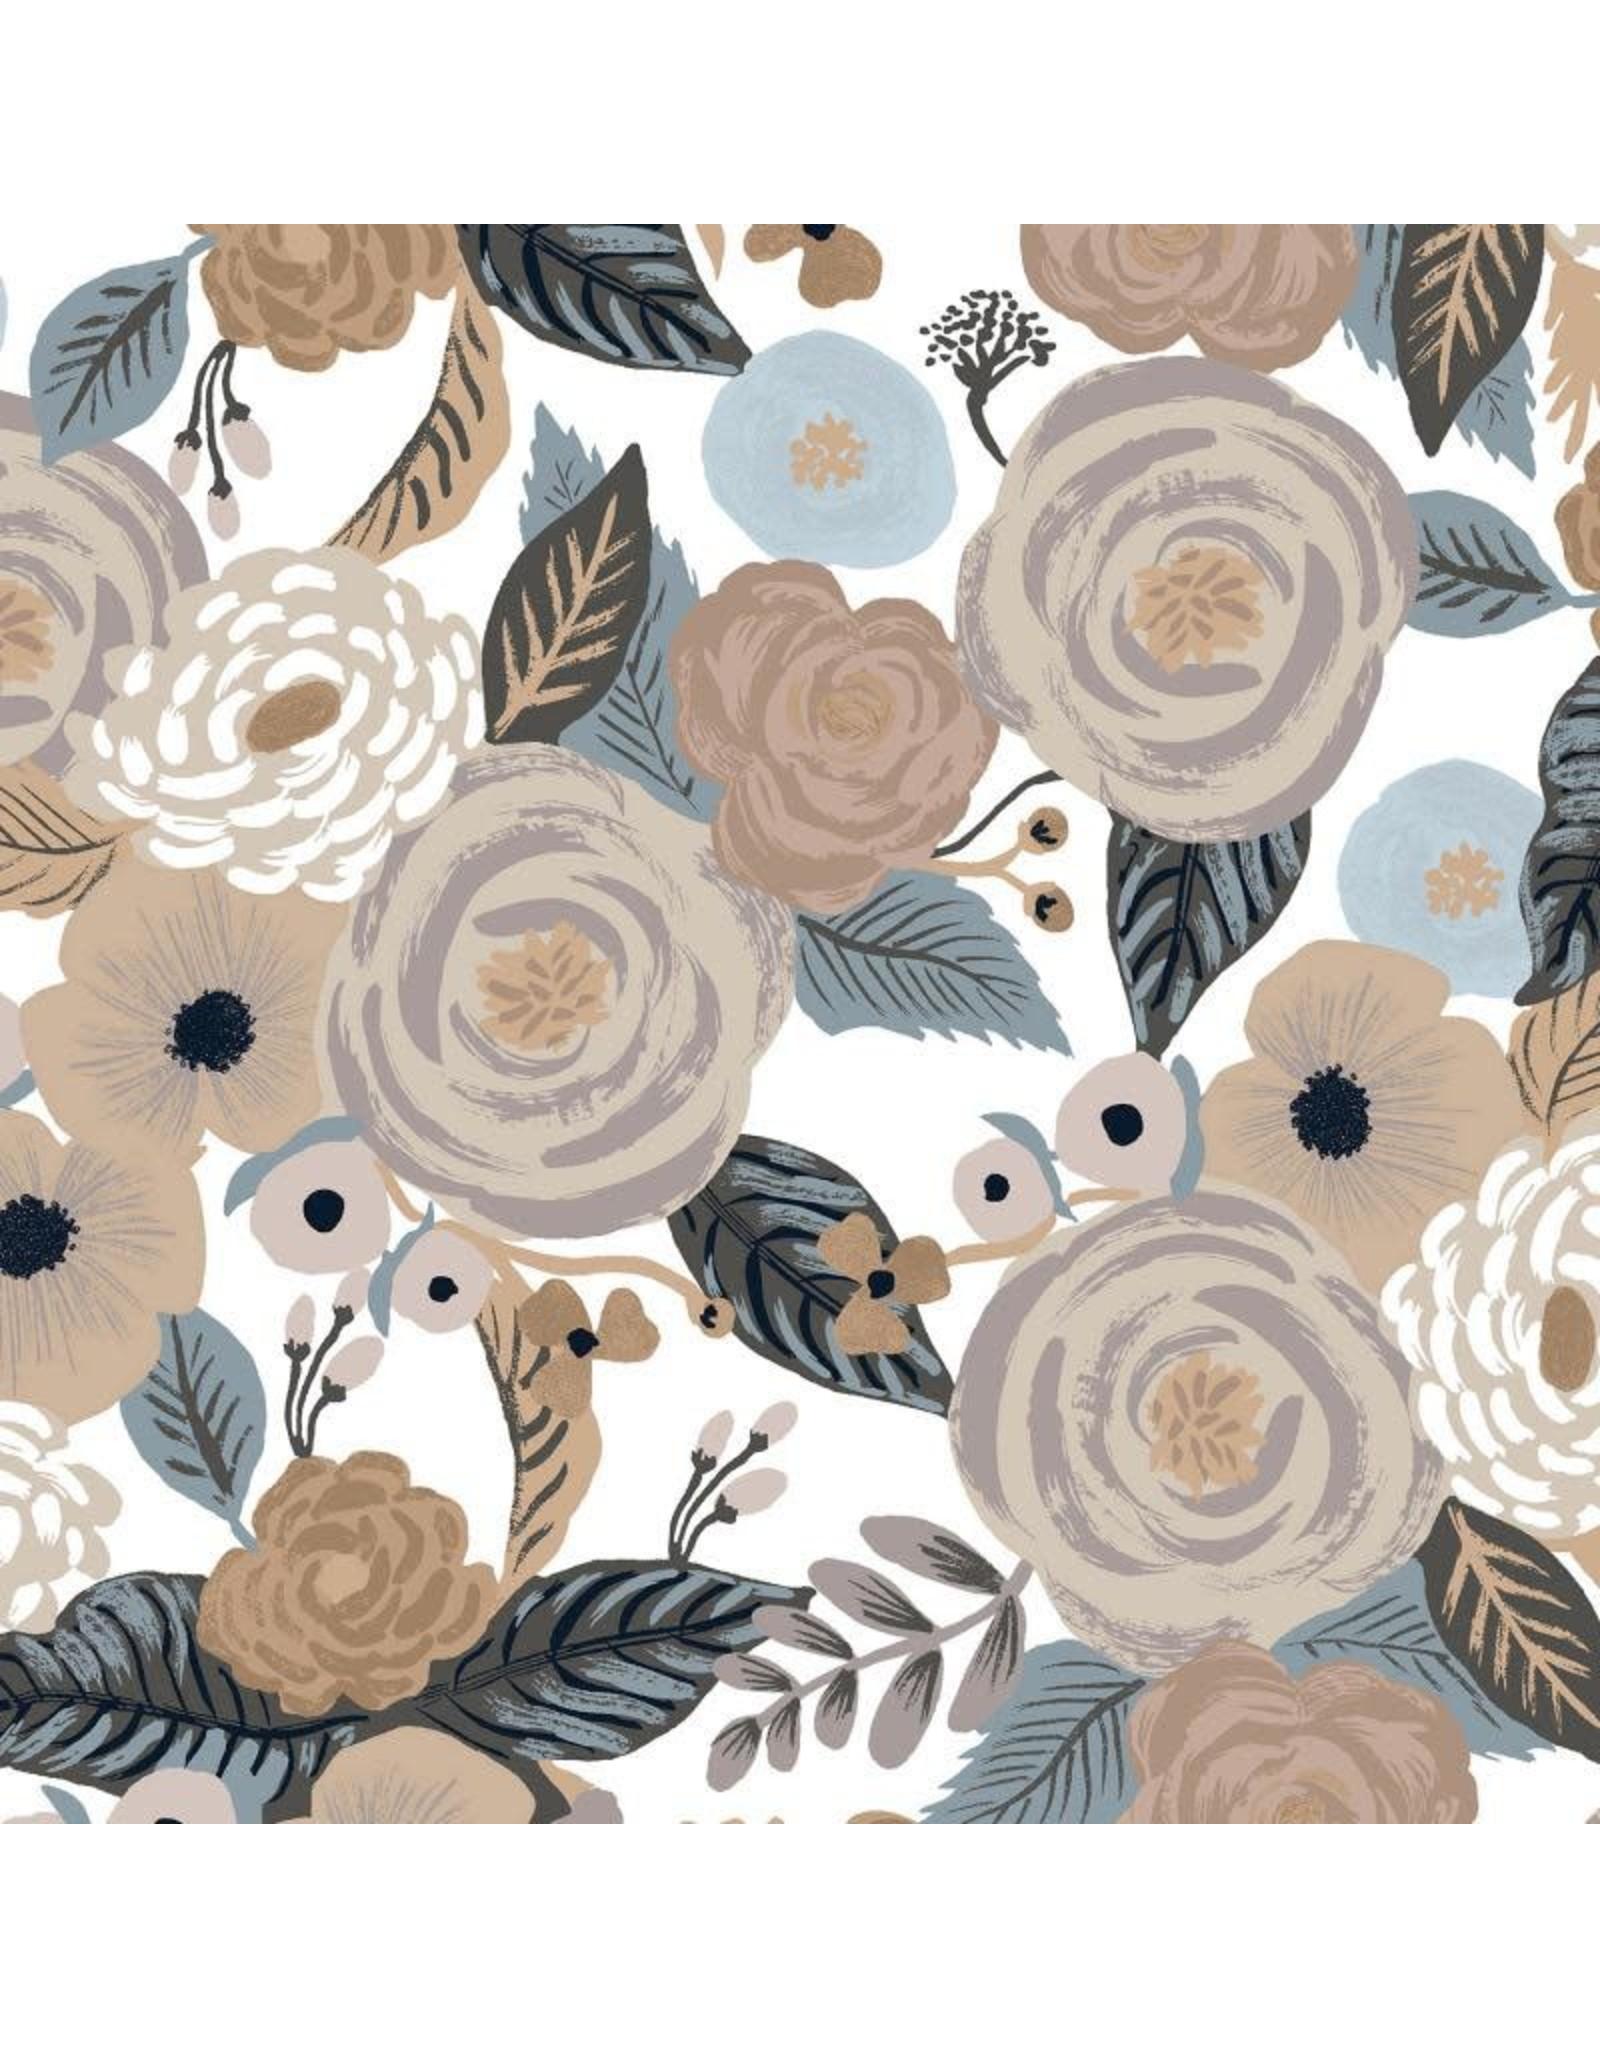 Rifle Paper Co. Linen/Cotton Canvas, Garden Party, Juliet Rose in Linen Multi, Fabric Half-Yards RP520-LM2C